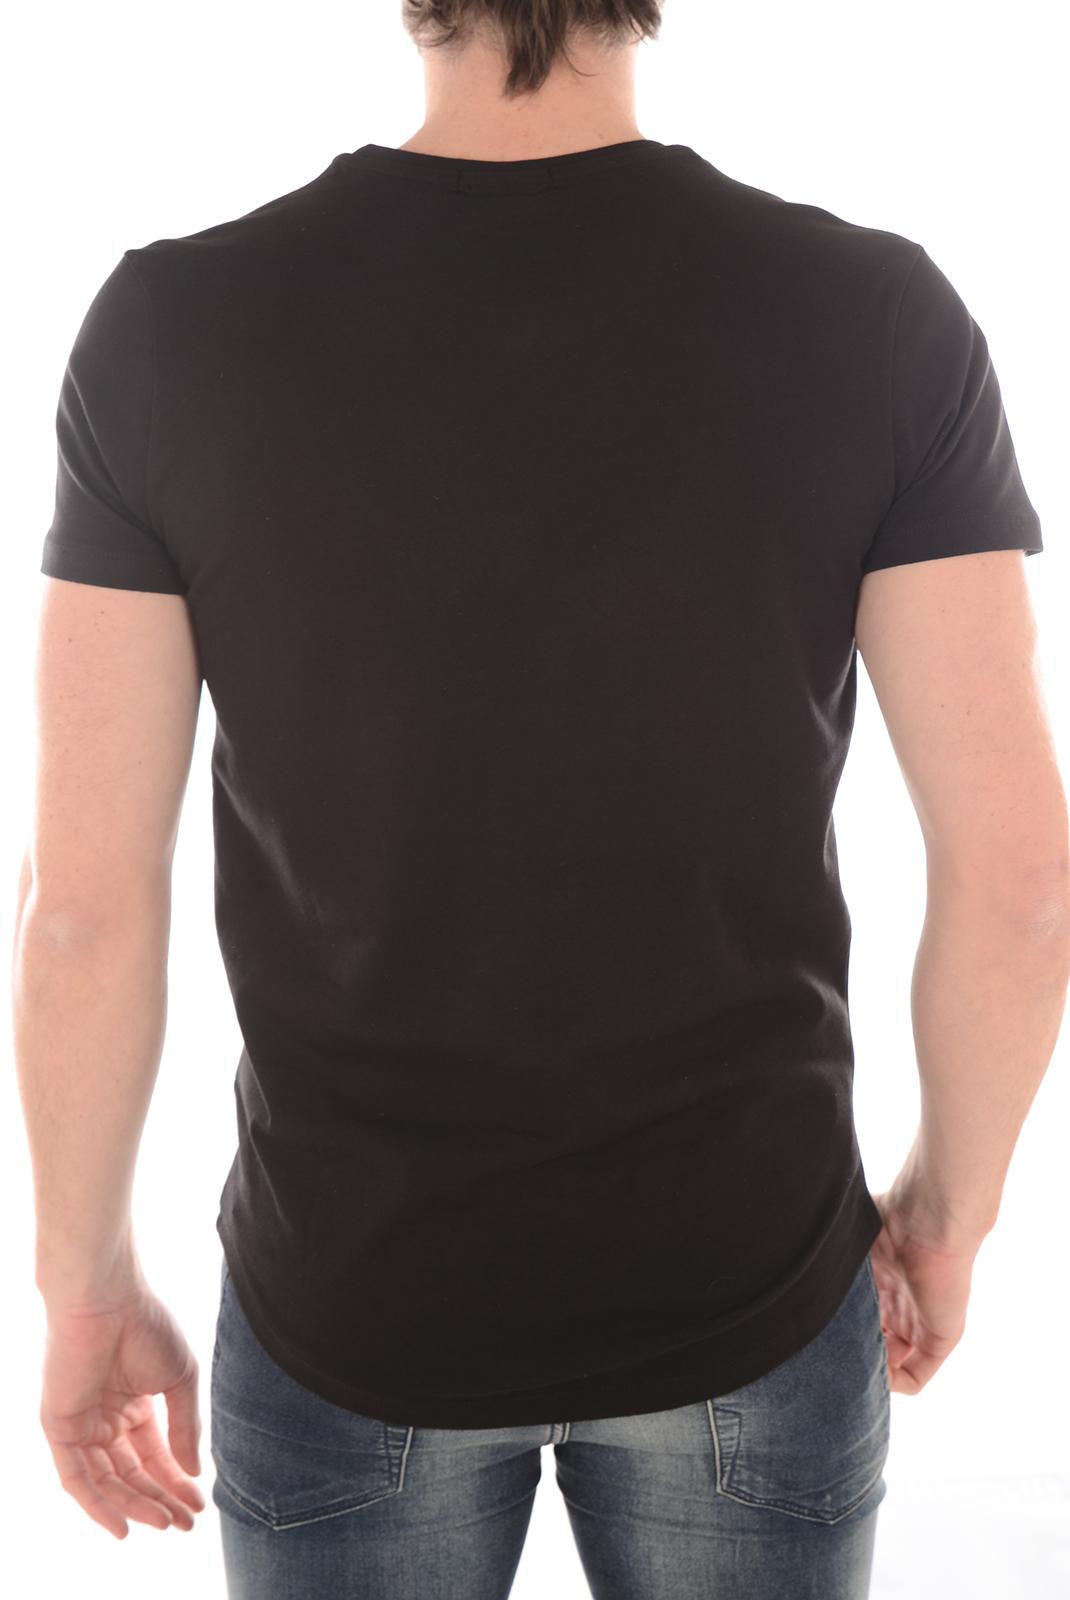 Tee-shirts  Redskins FRISBEE SCOOBA BLACK